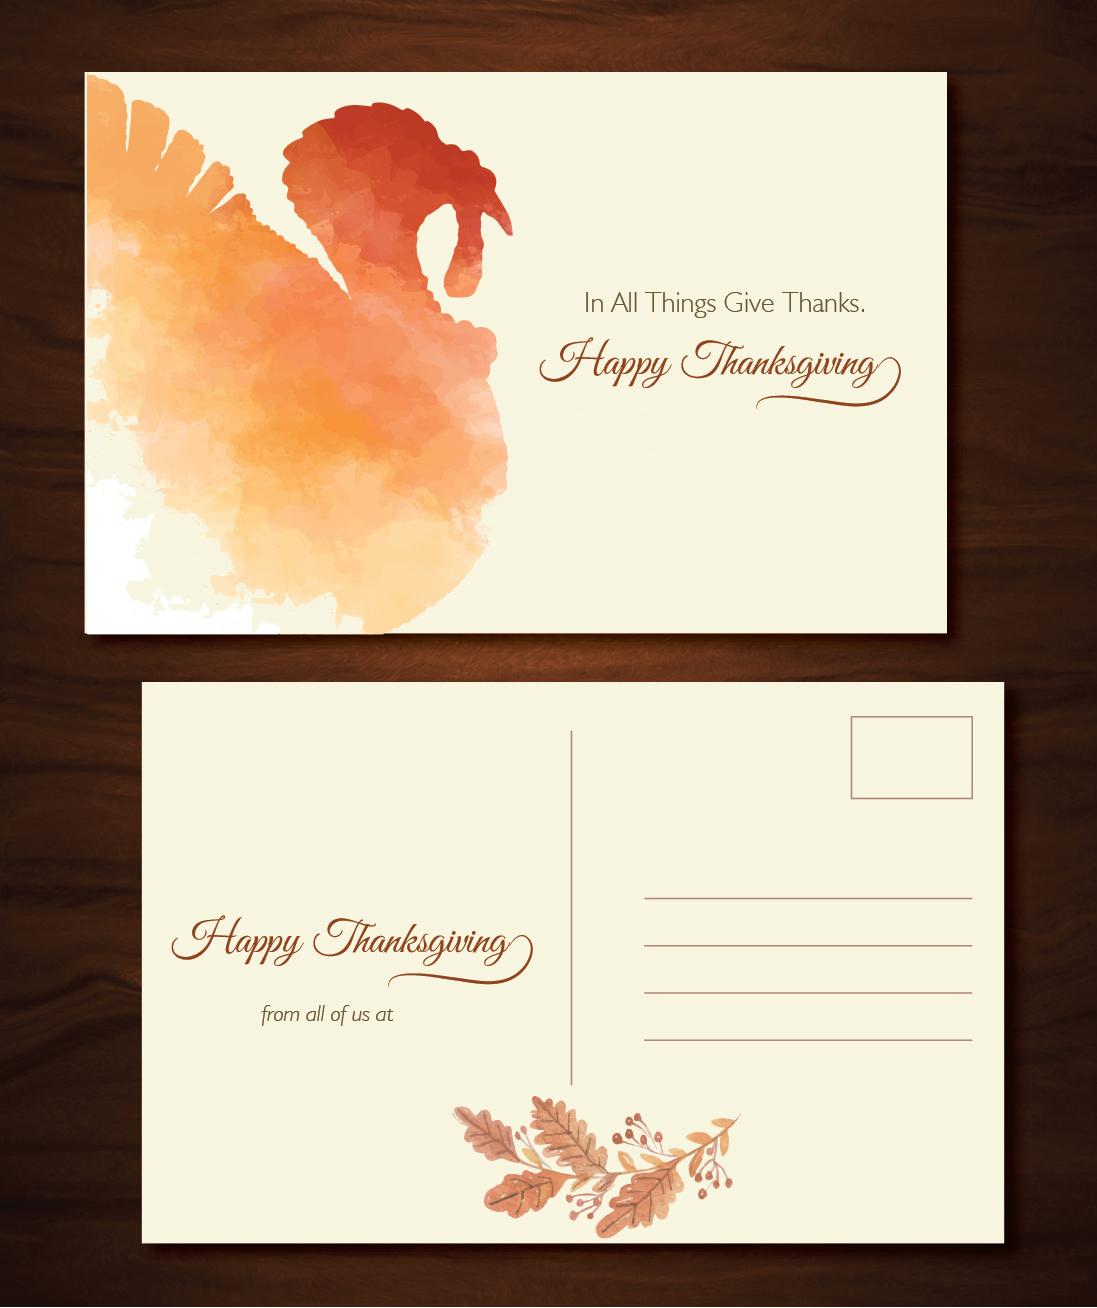 Playful Bold Greeting Card Design For Alabama Power Company By Sam